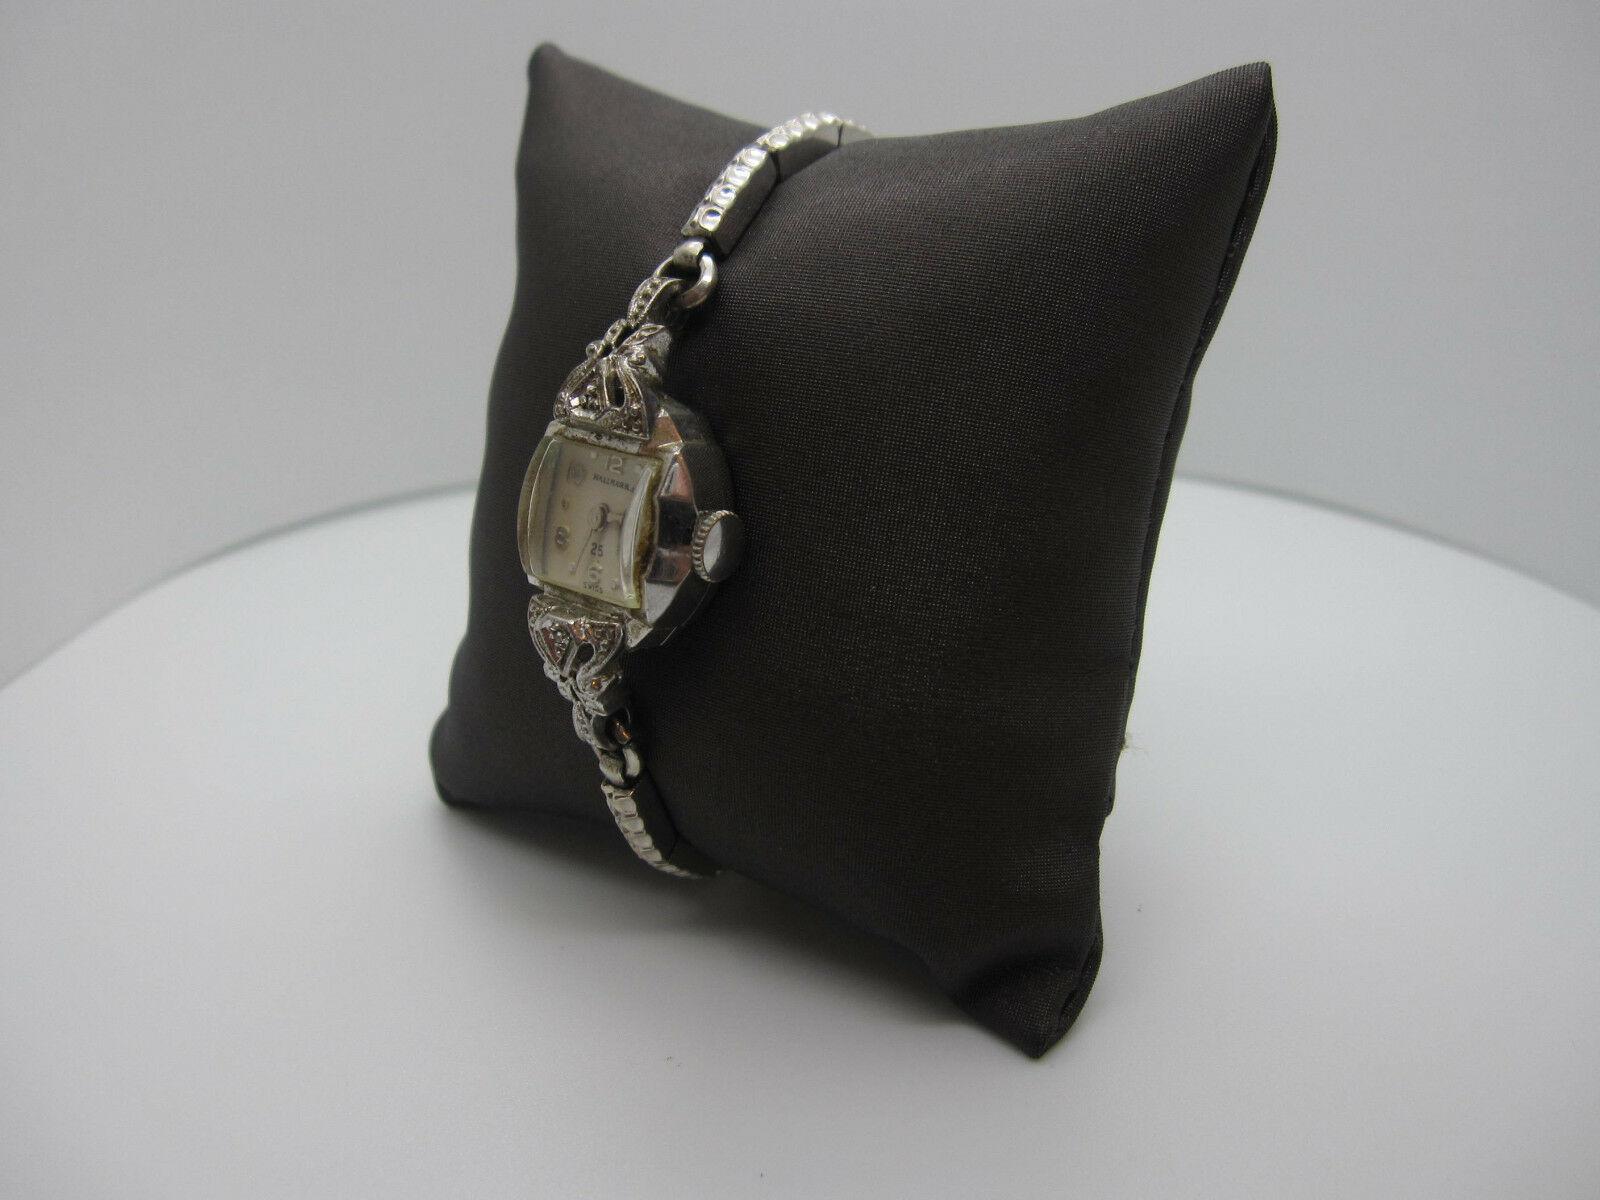 Vintage Women's Hallmark 25 Jewels 10k Rolled Gold Plated Hand Wind Watch image 4